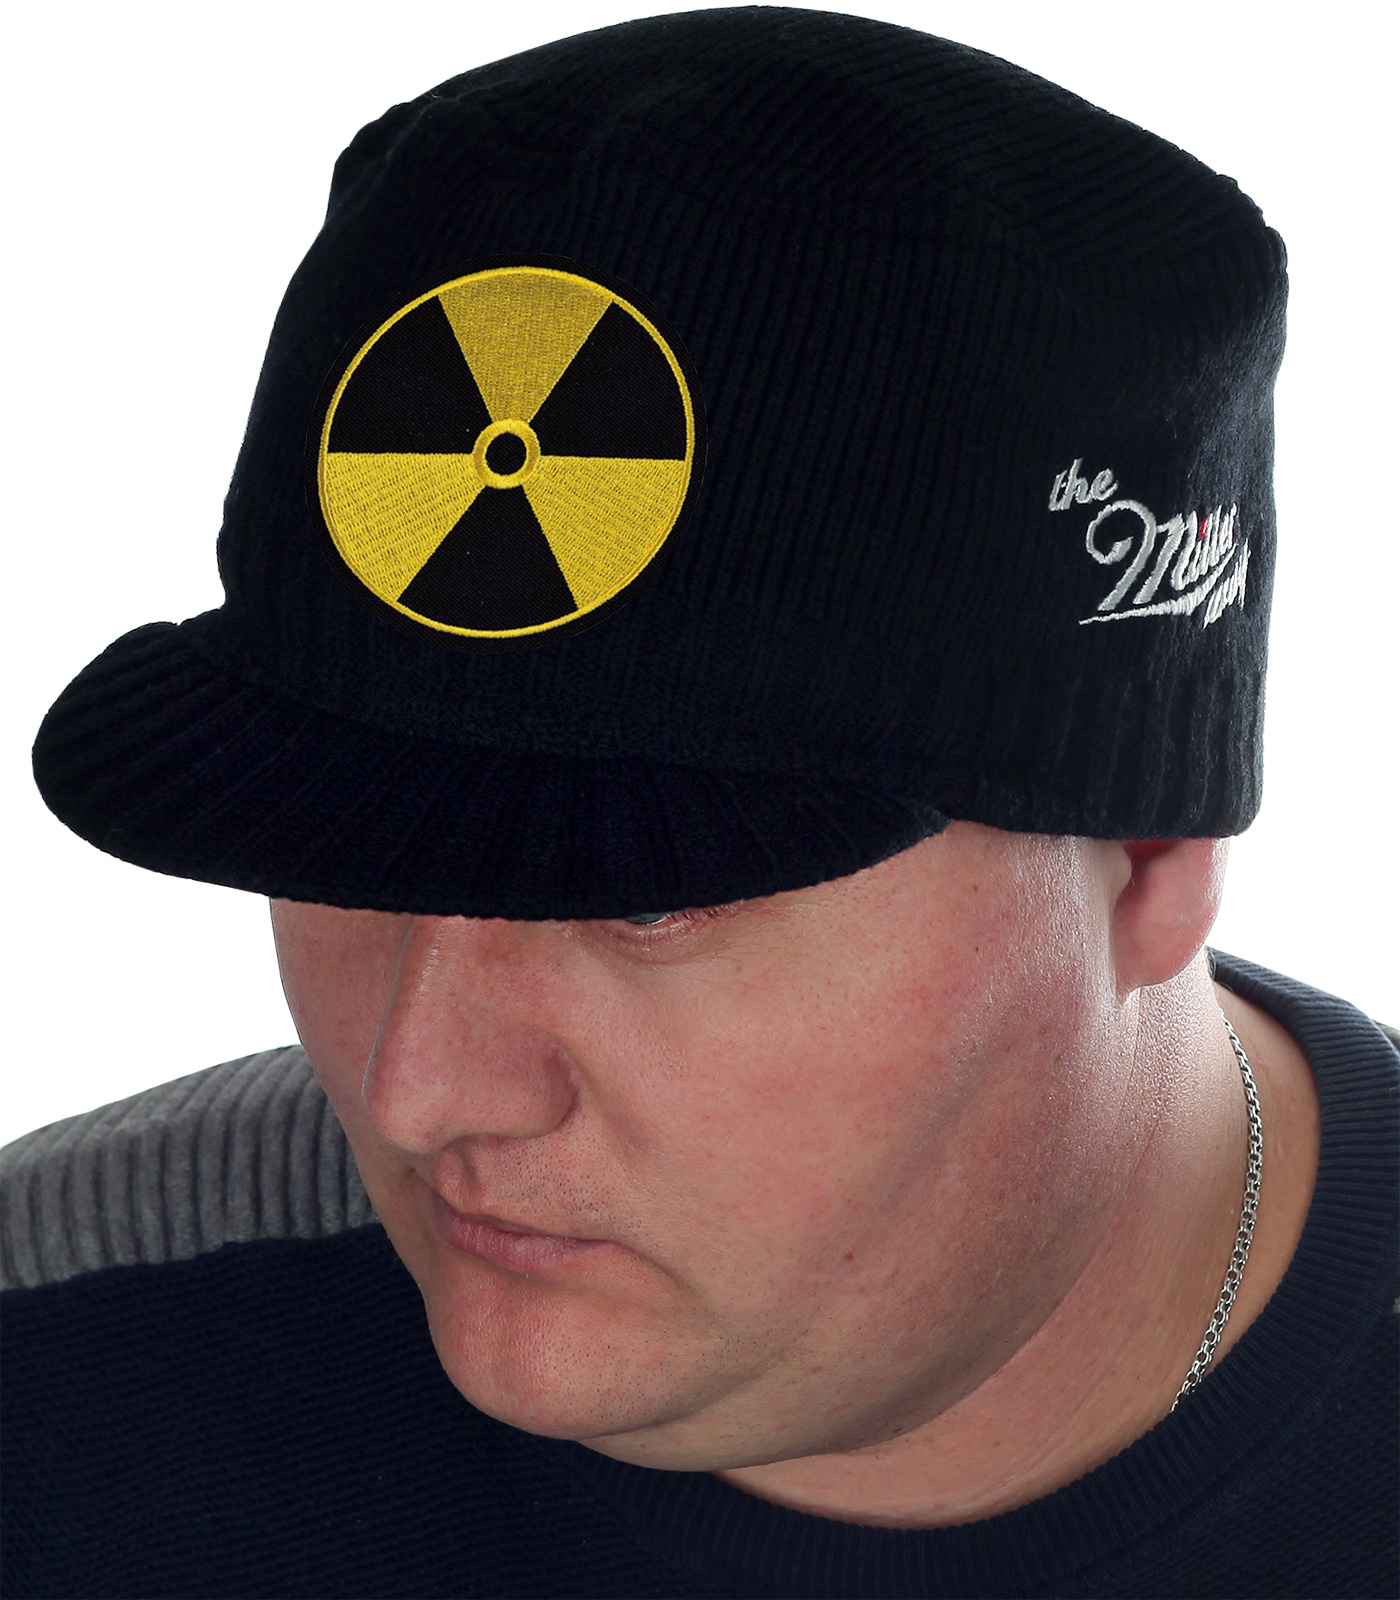 "Мужская вязаная кепка Miller Way в дизайне ""Радиация"""